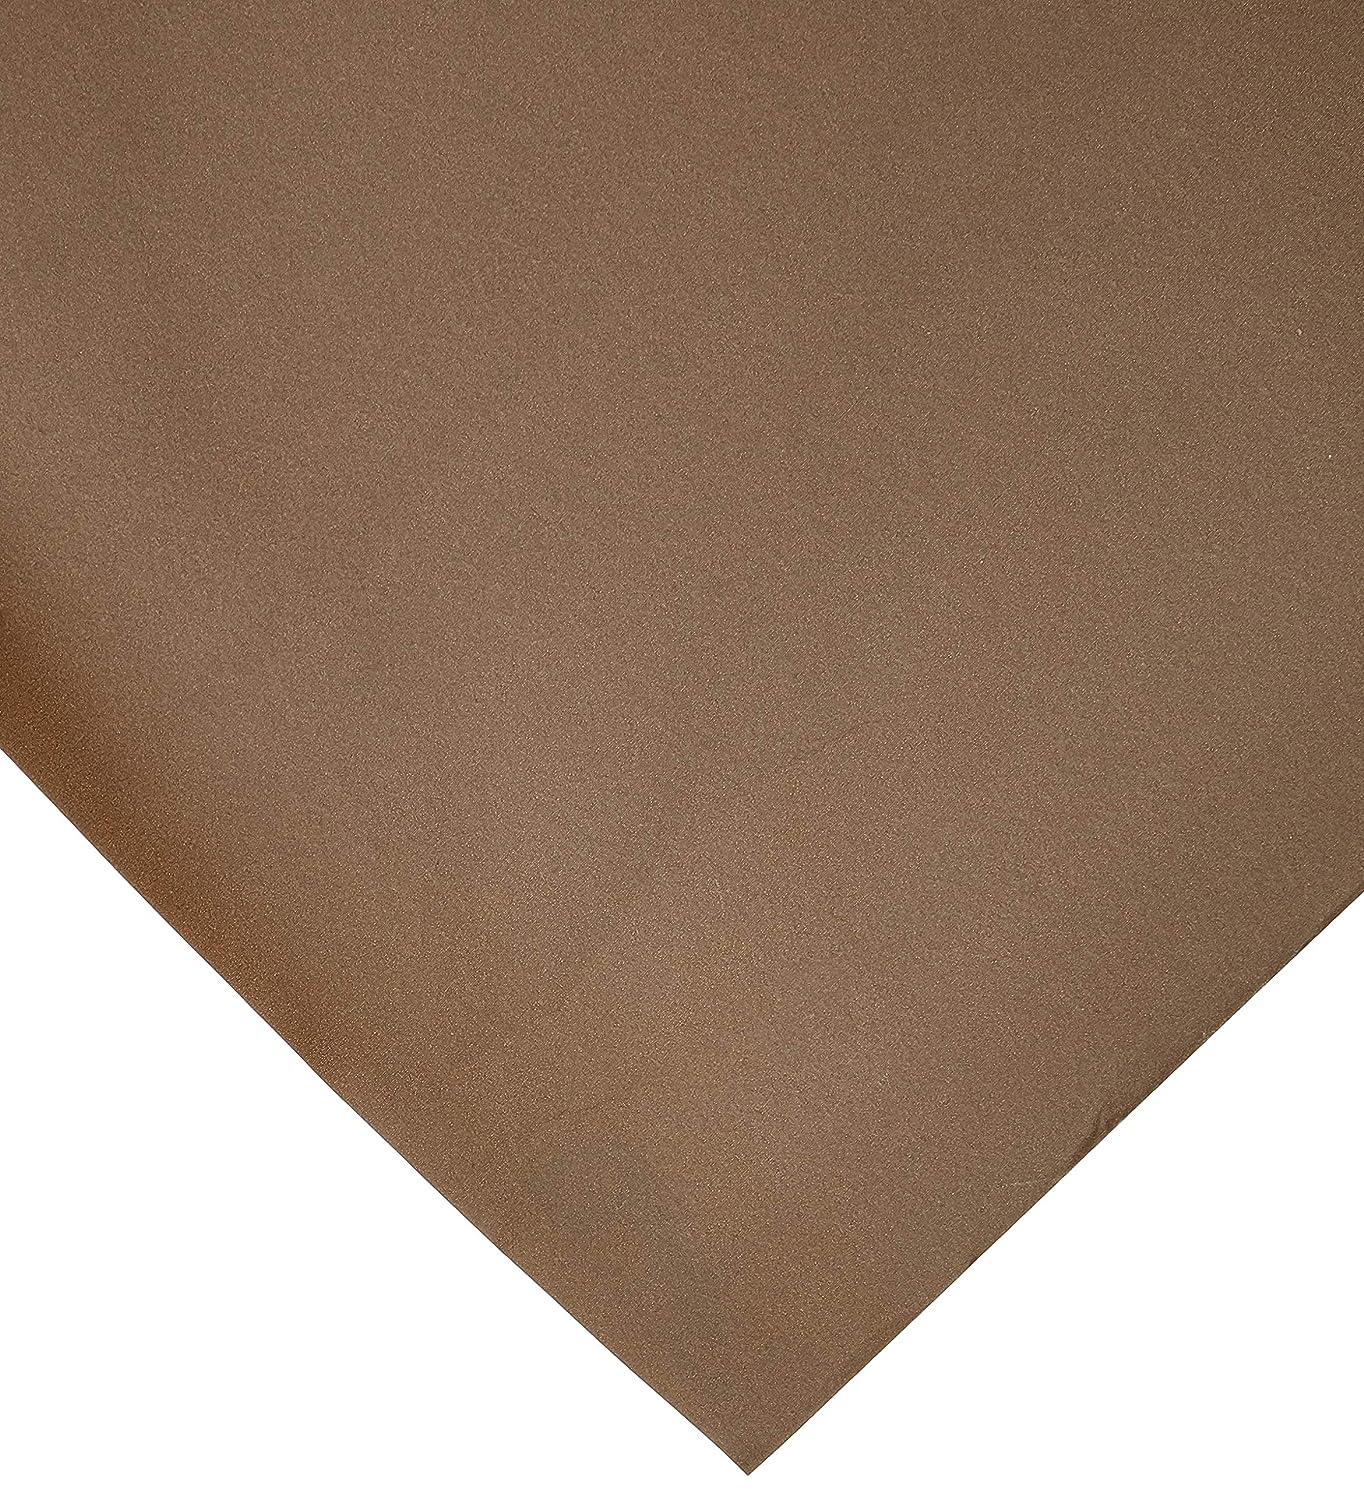 AmazonBasics Gift Ream Ivory P9064C/ Taupe P405U, 70cm x 100m, 70 GSM Craft Paper